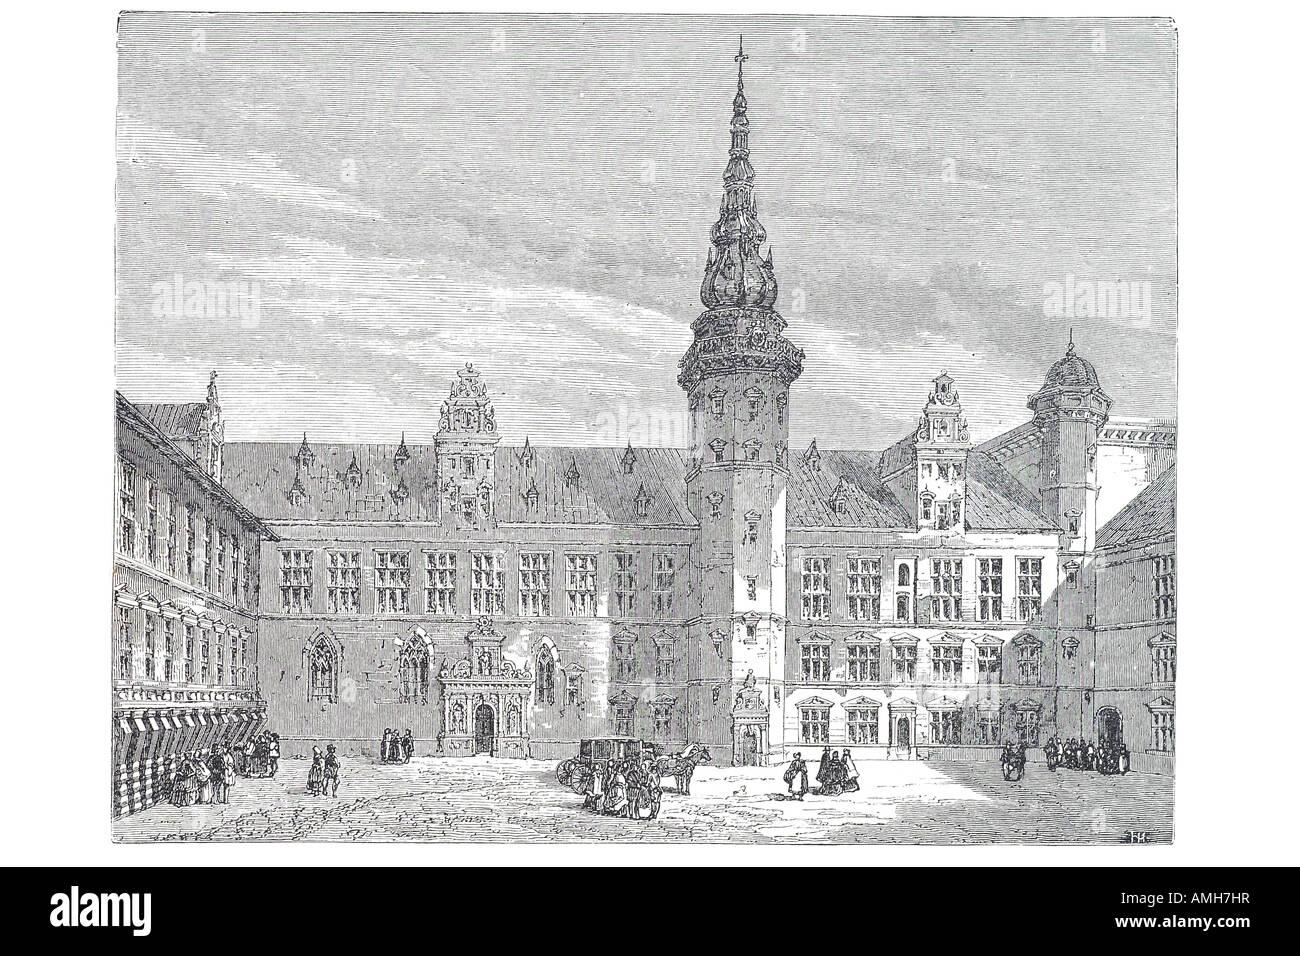 danish chateau castle, Denmark, Scandinavia, Europe, national historical museum courtyard - Stock Image